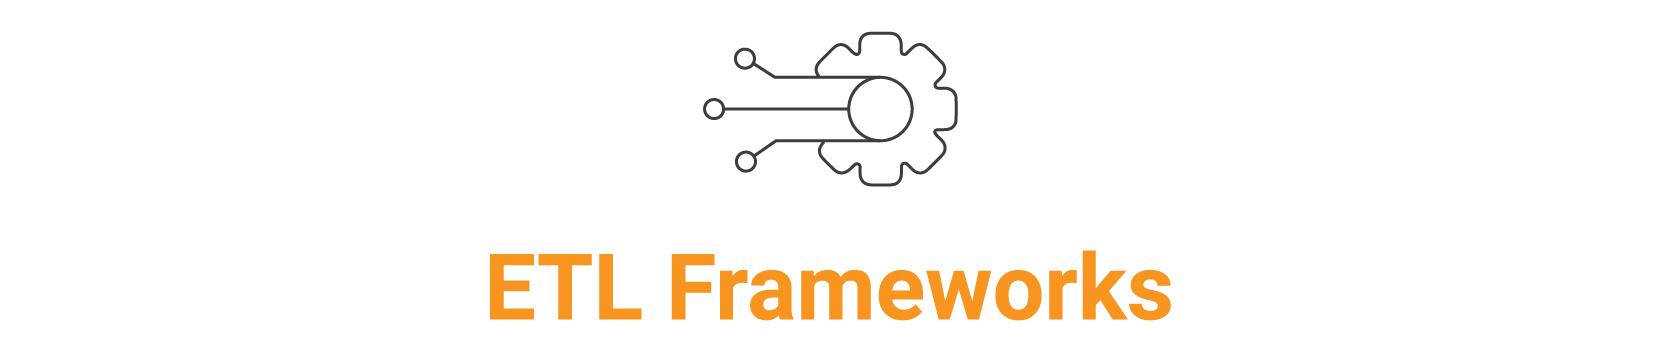 ETL Frameworks  + ICON copy 2 (1)-1